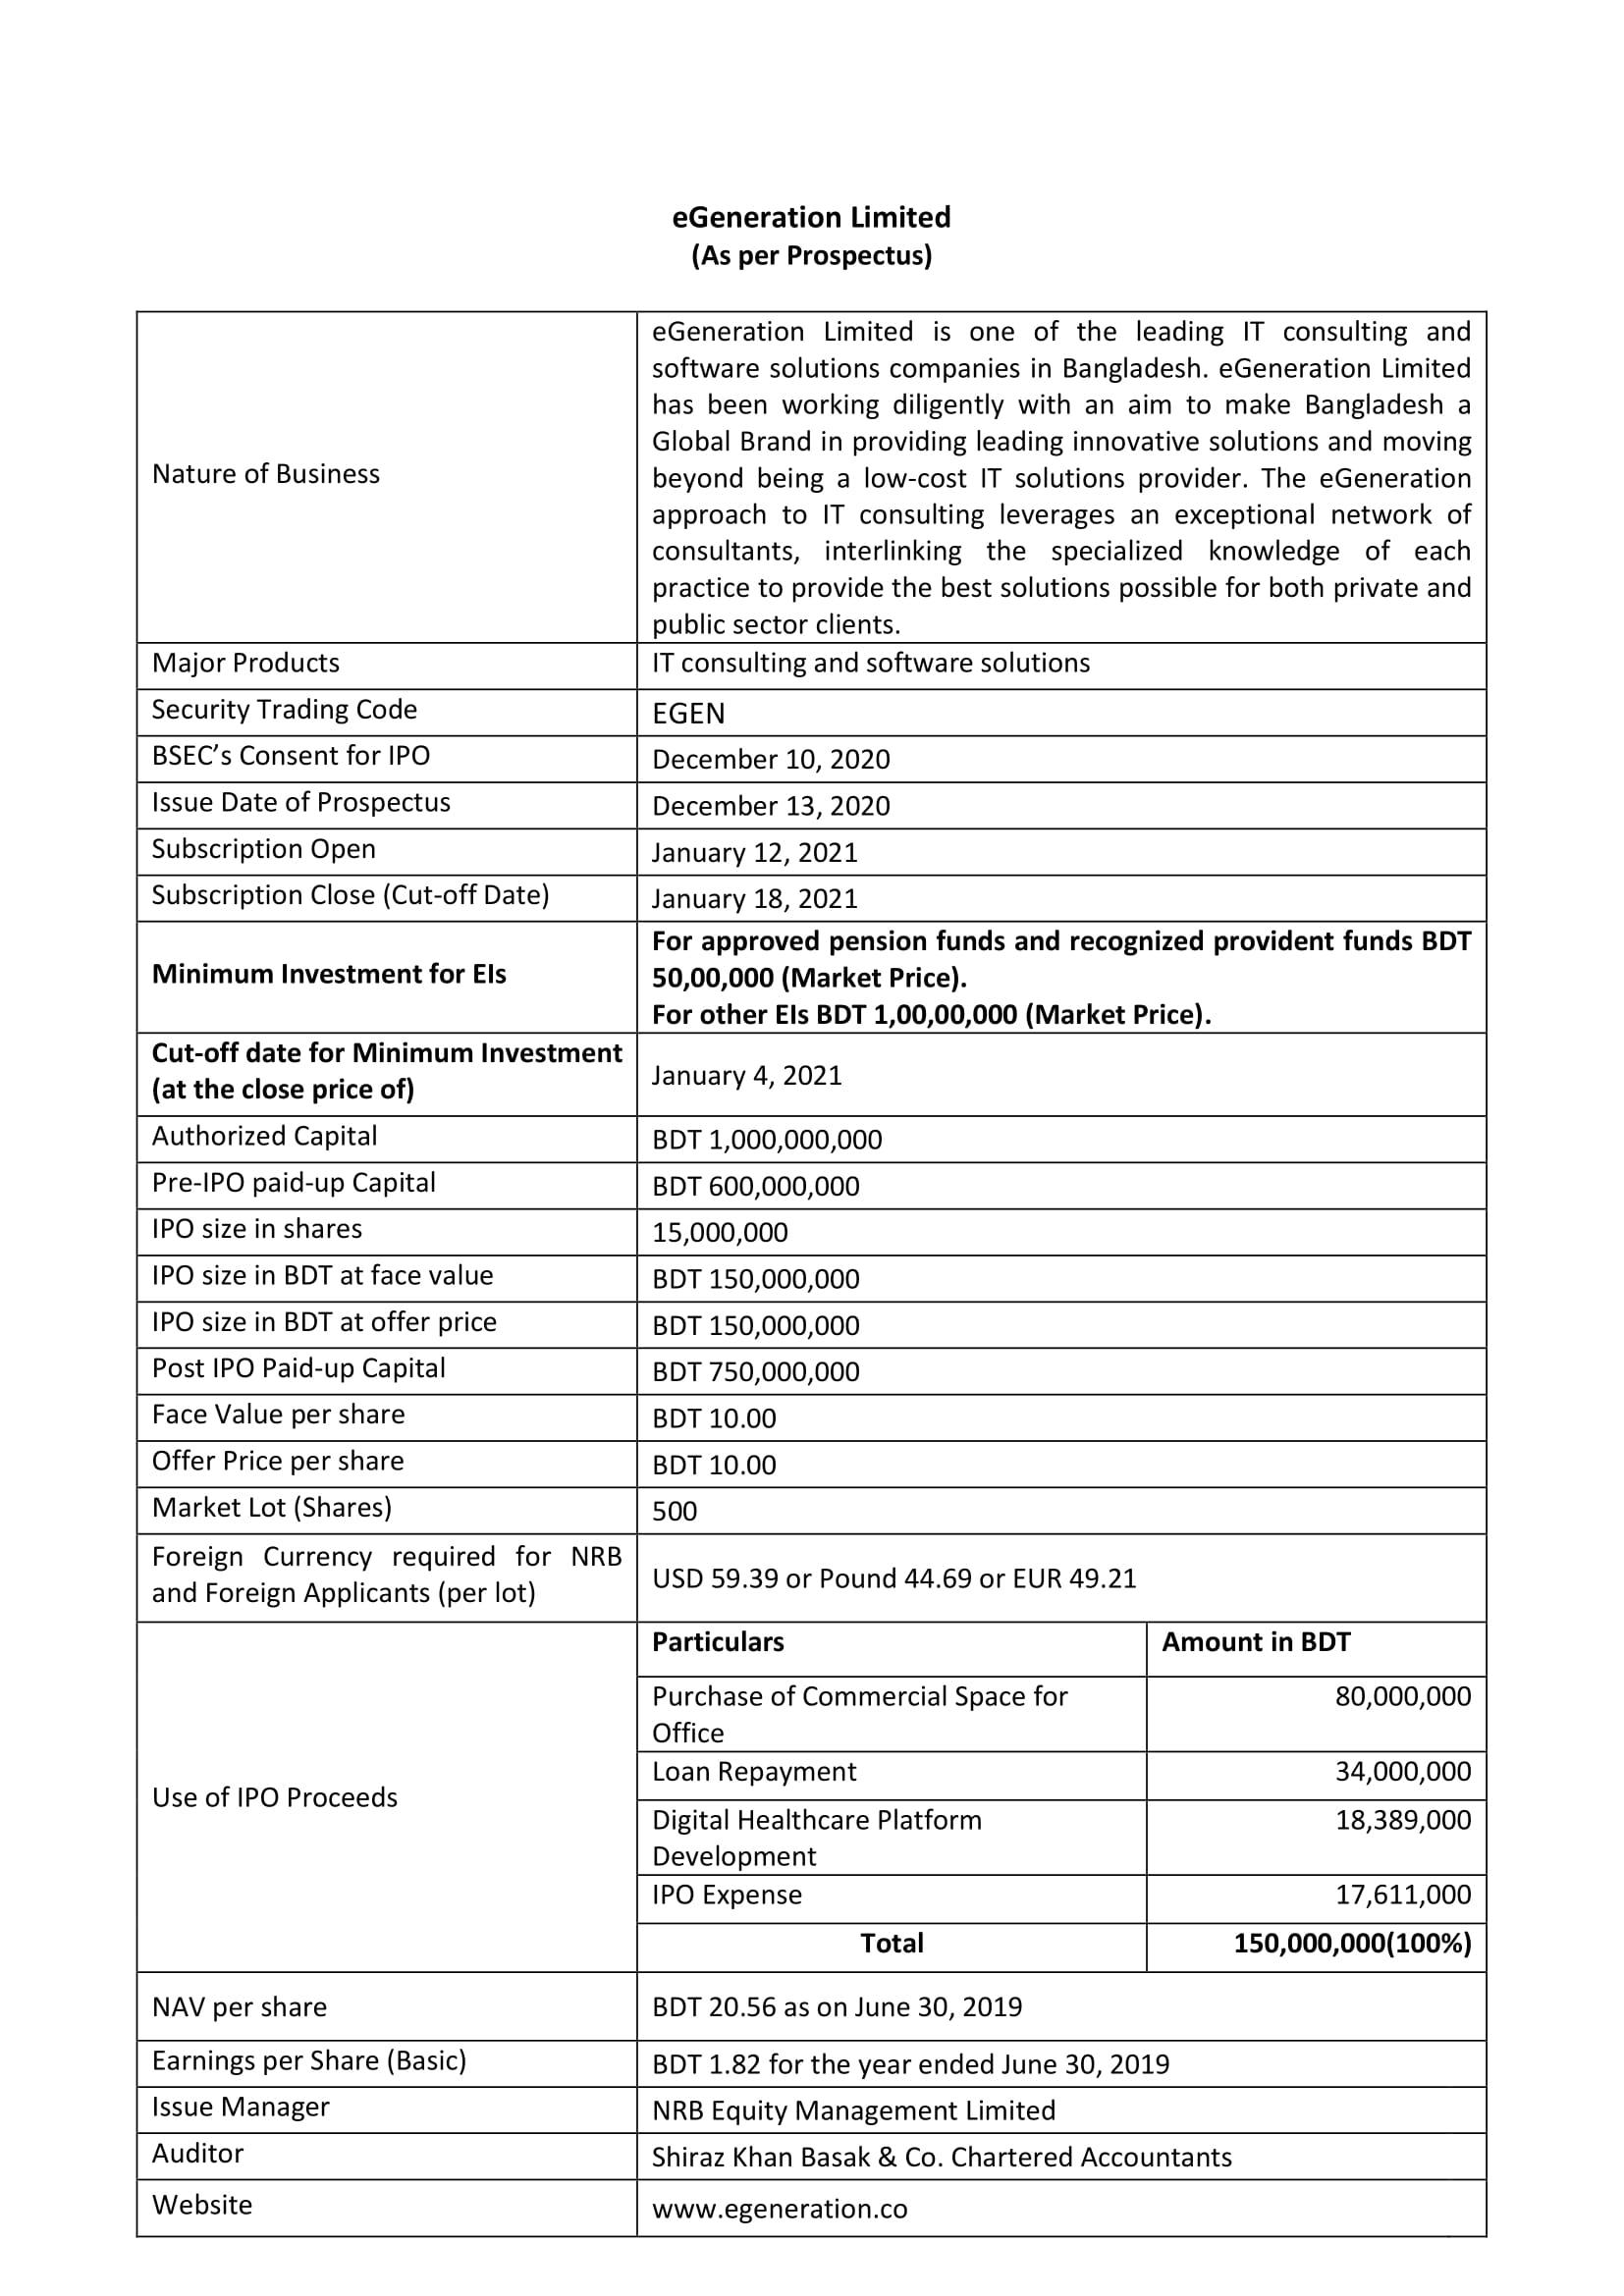 Egeneration Ltd IPO 2021